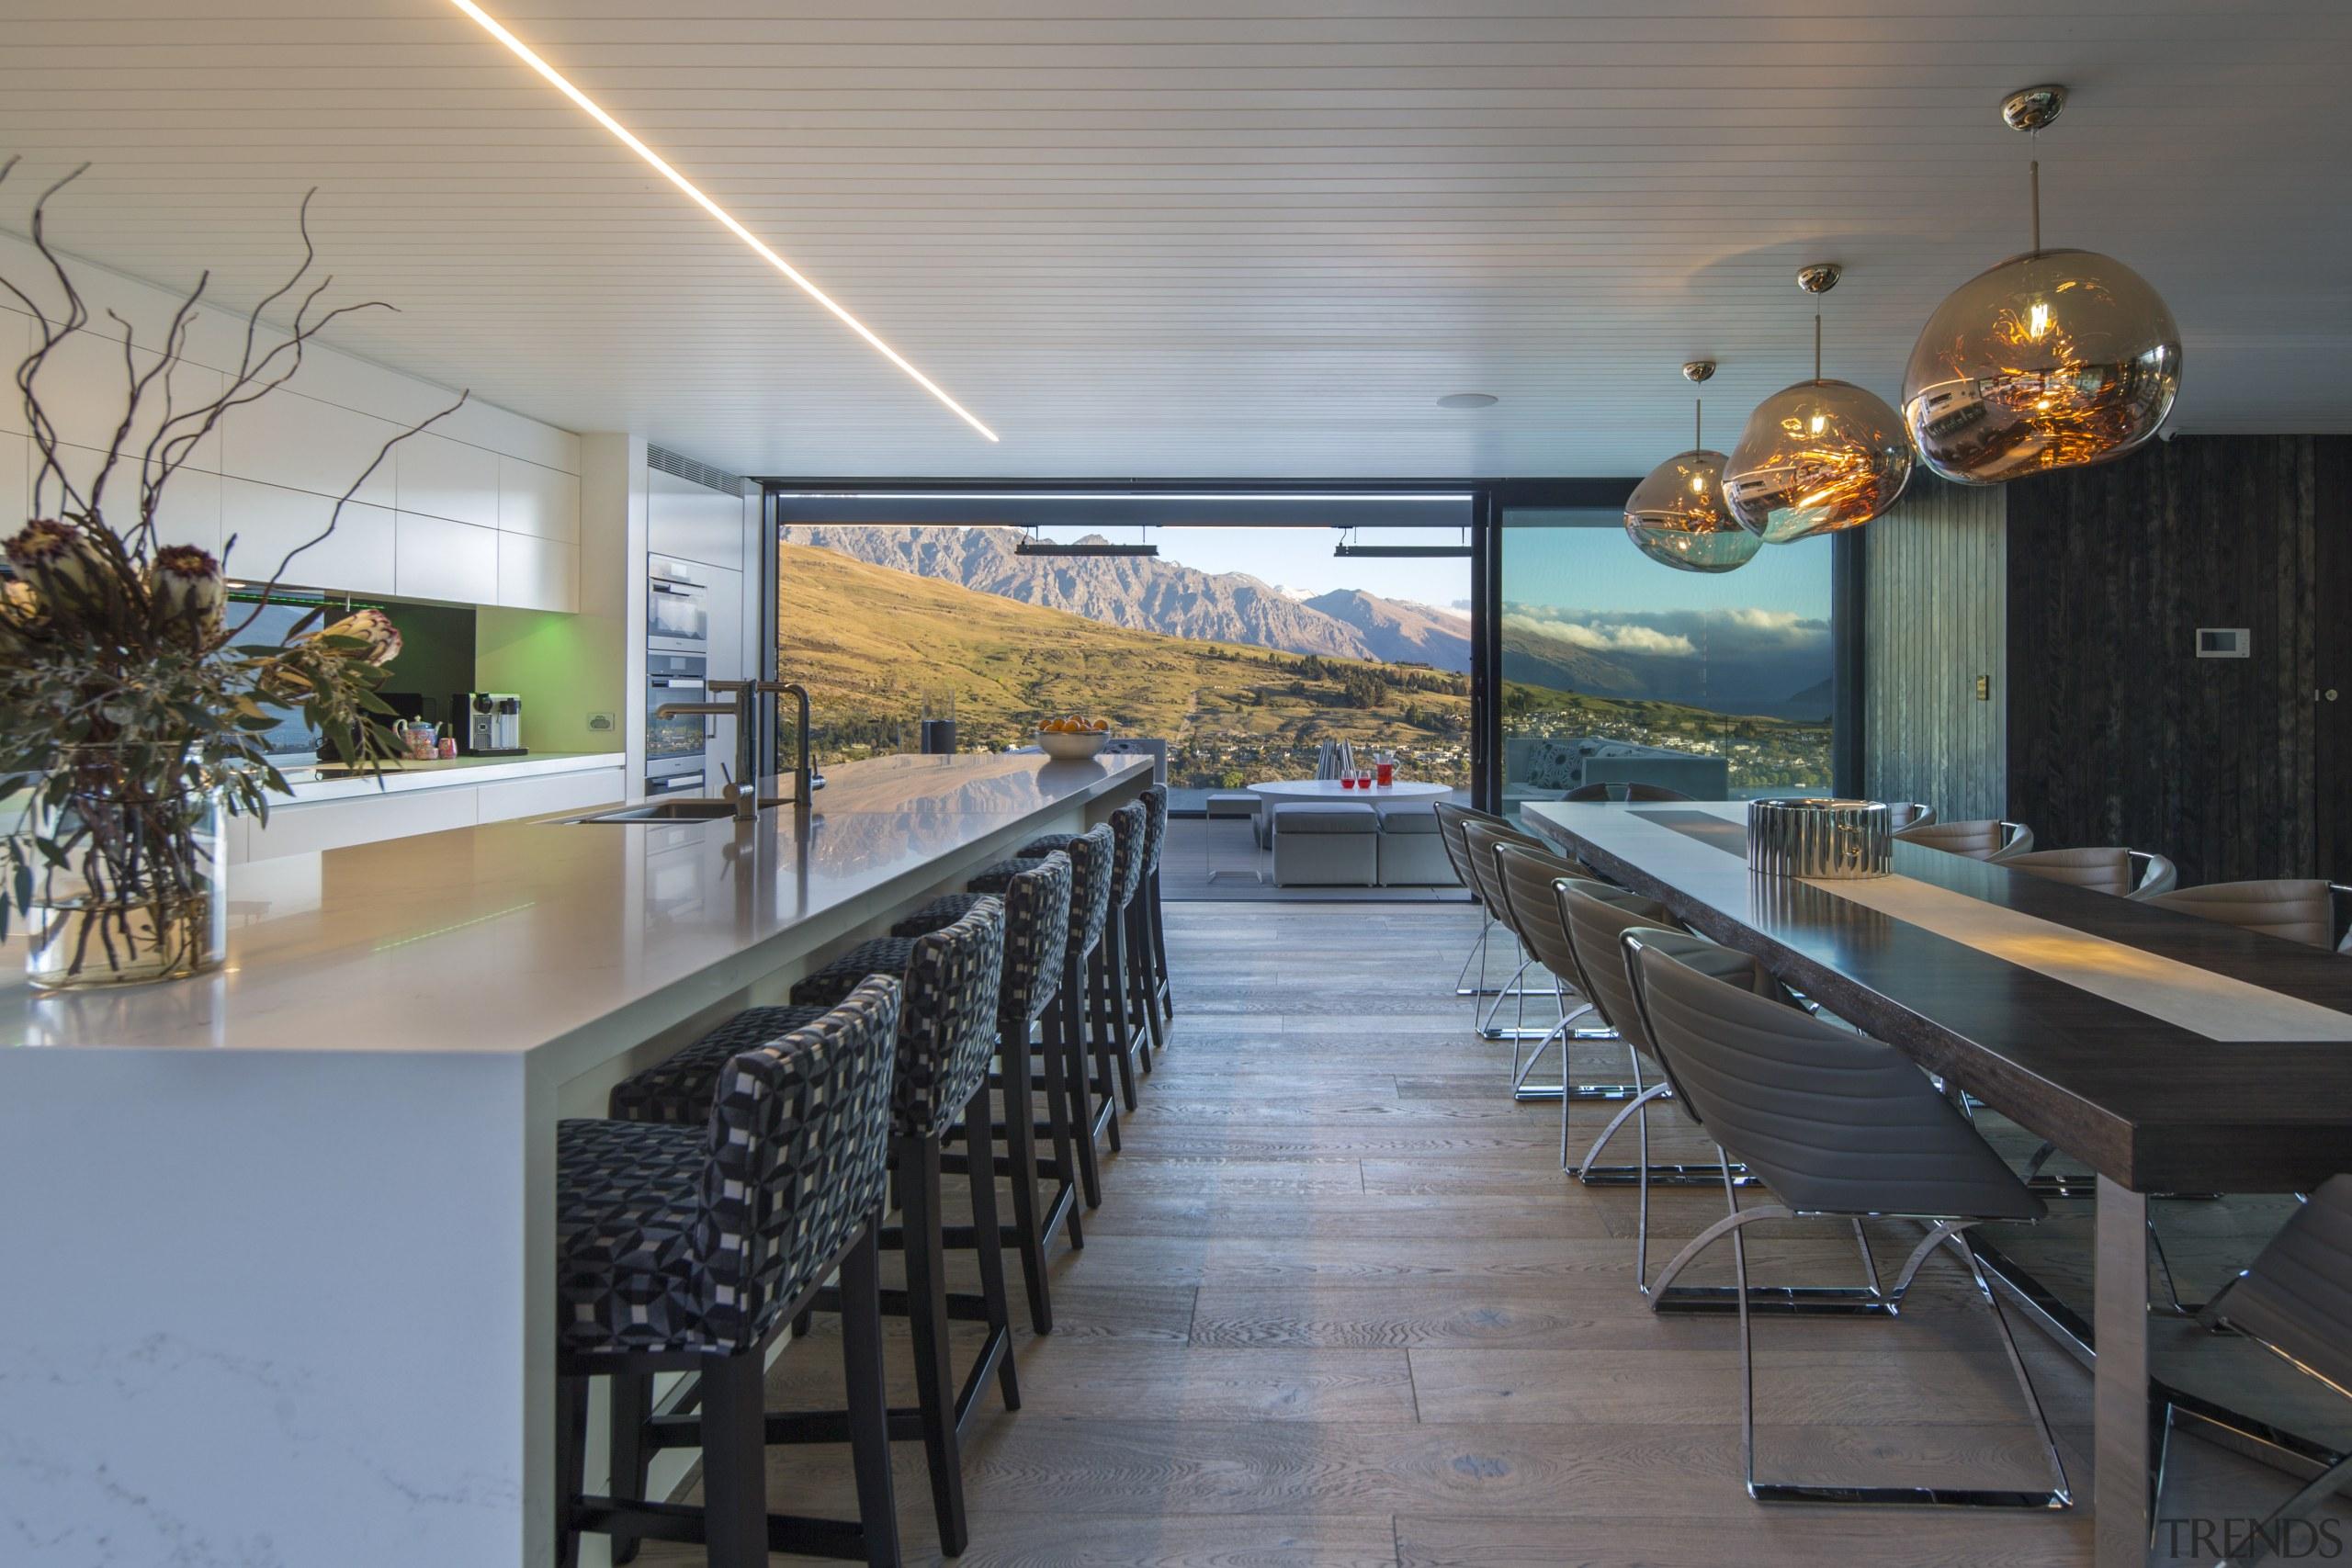 The long white, minimalist kitchen in this mountain gray, black